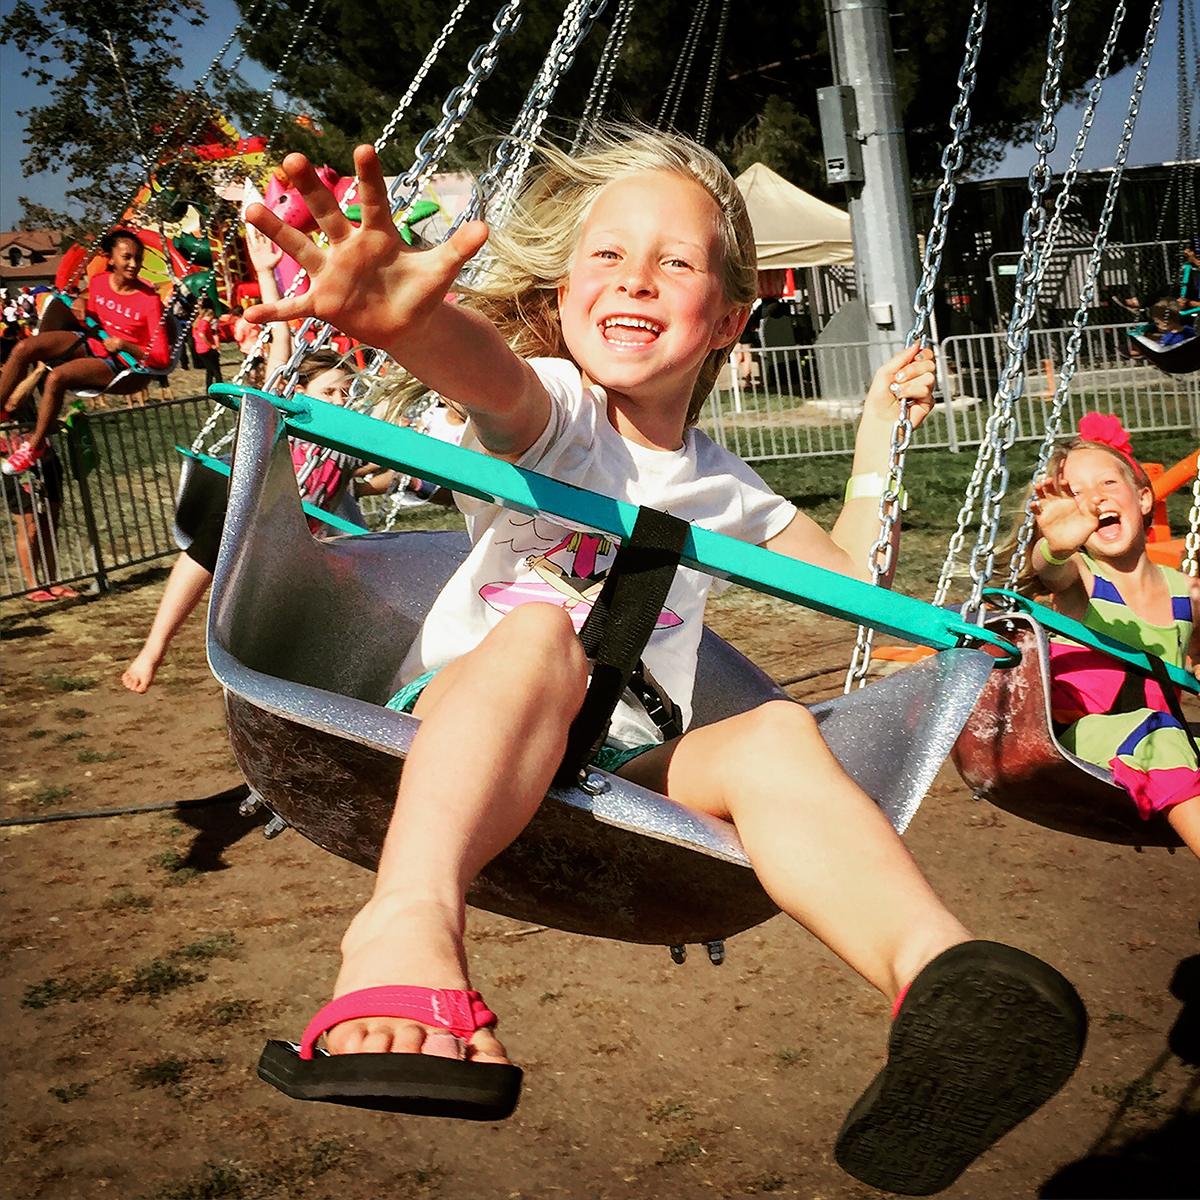 Tim_Hale_Web2_Kids_25.jpg